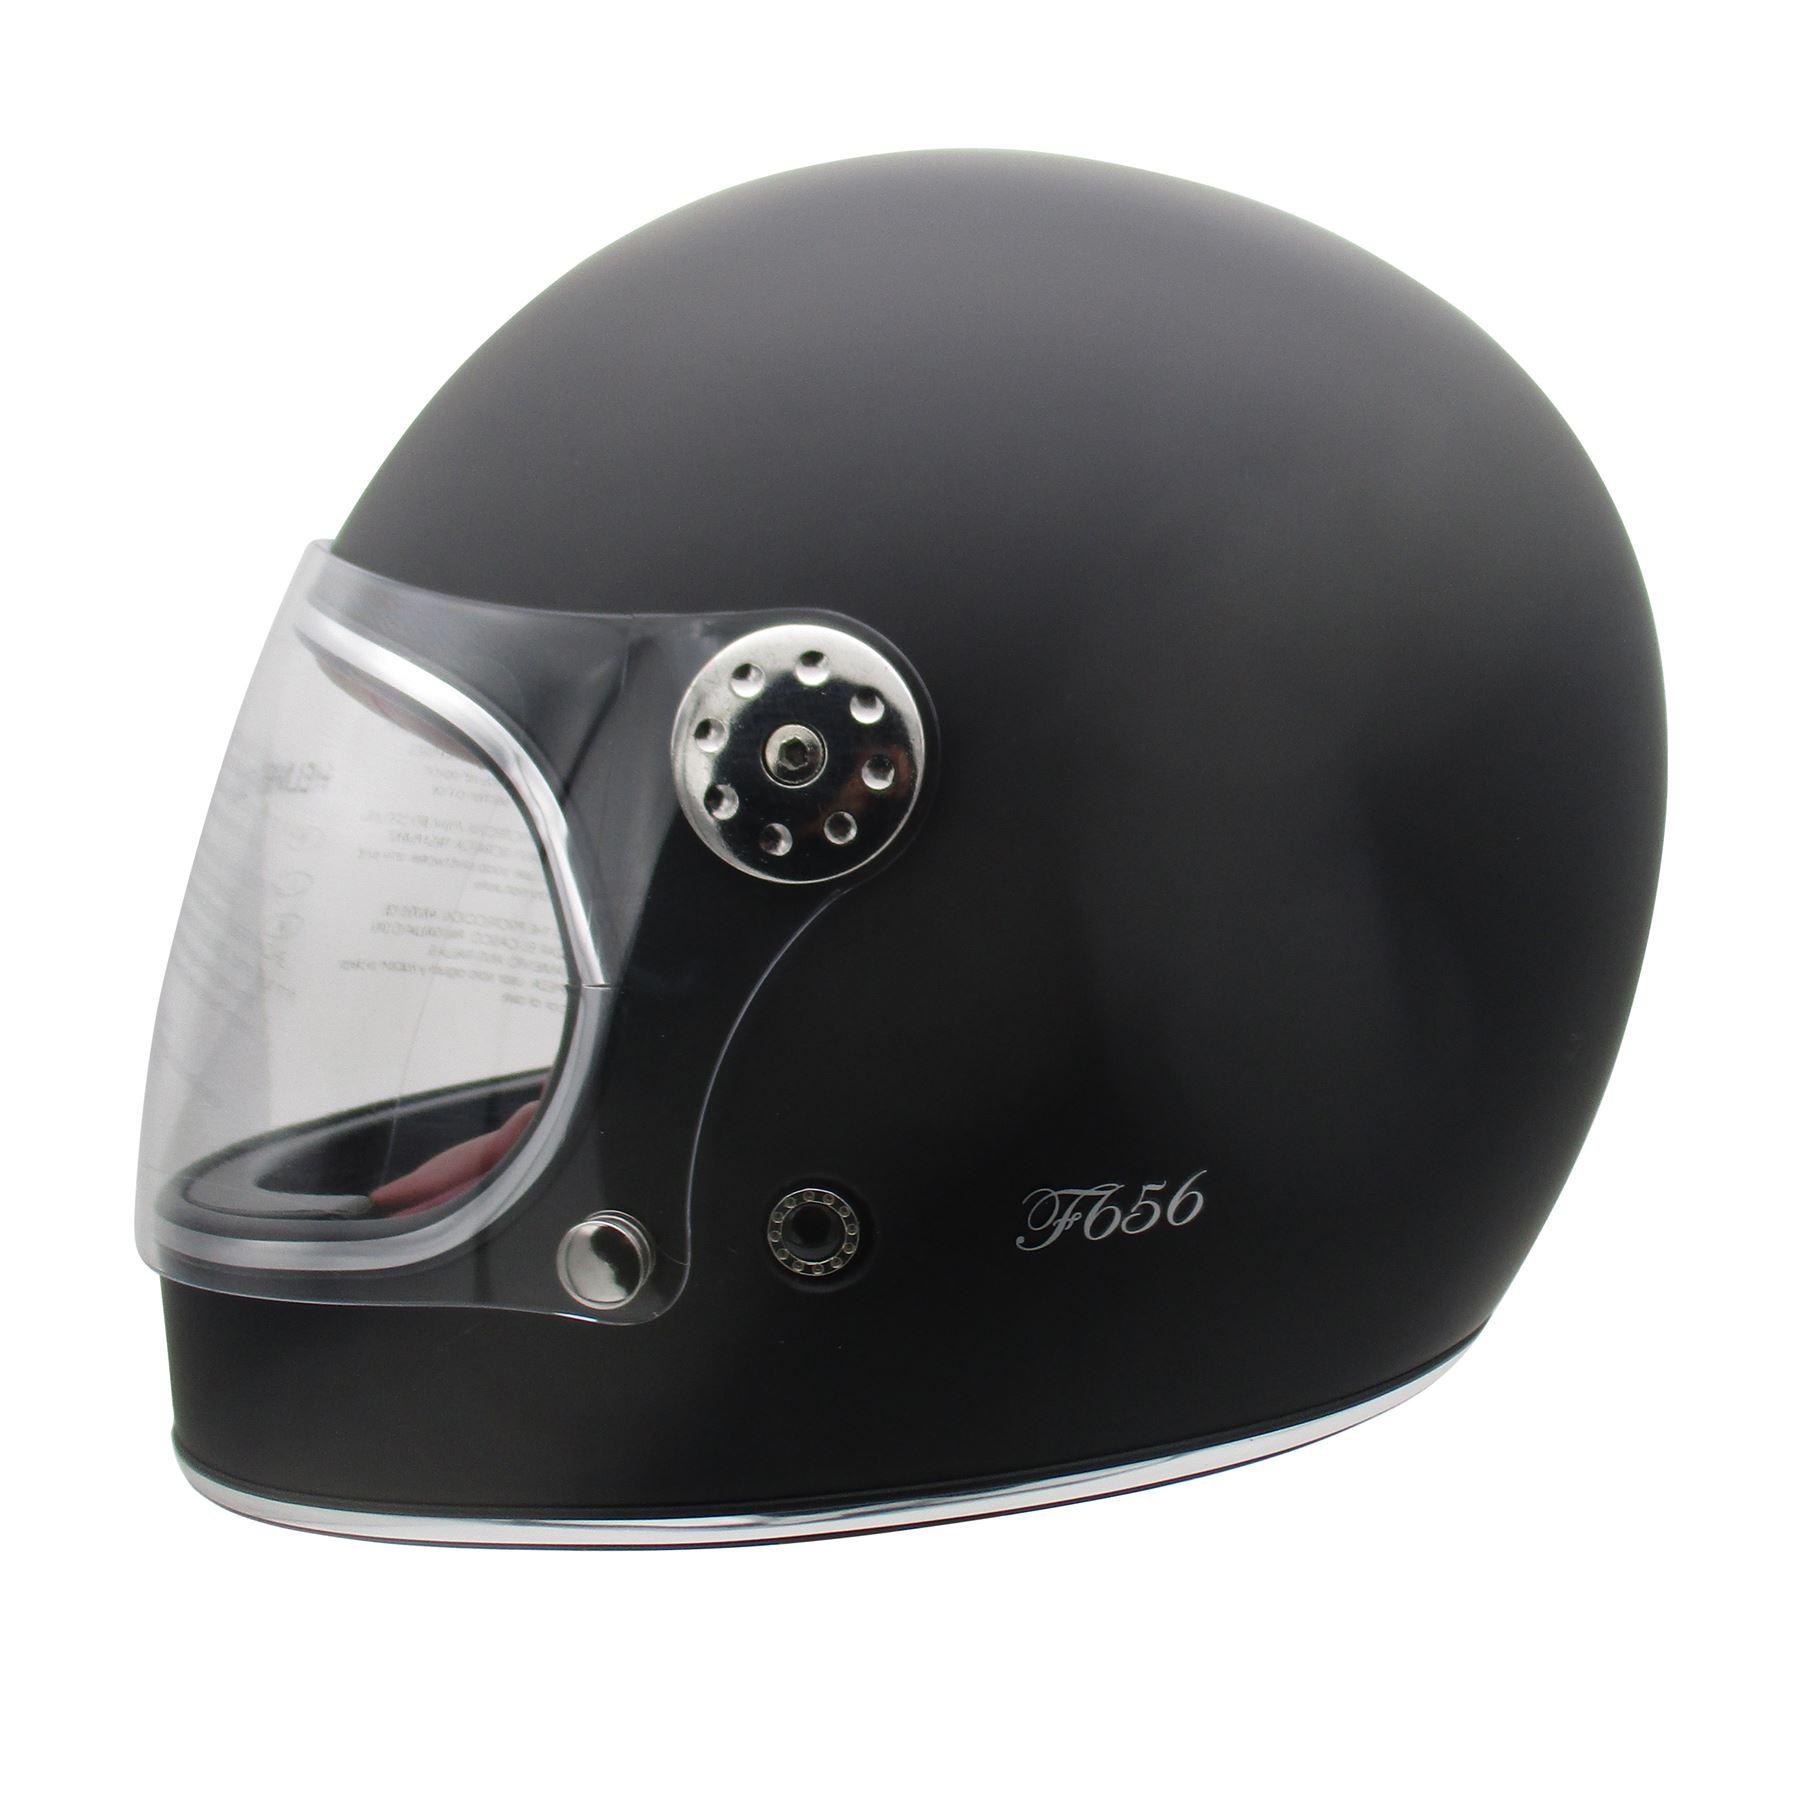 Viper-F656-Retro-Vintage-FibreGlass-Full-Face-Motorcycle-Bike-Road-Crash-Helmet miniature 16